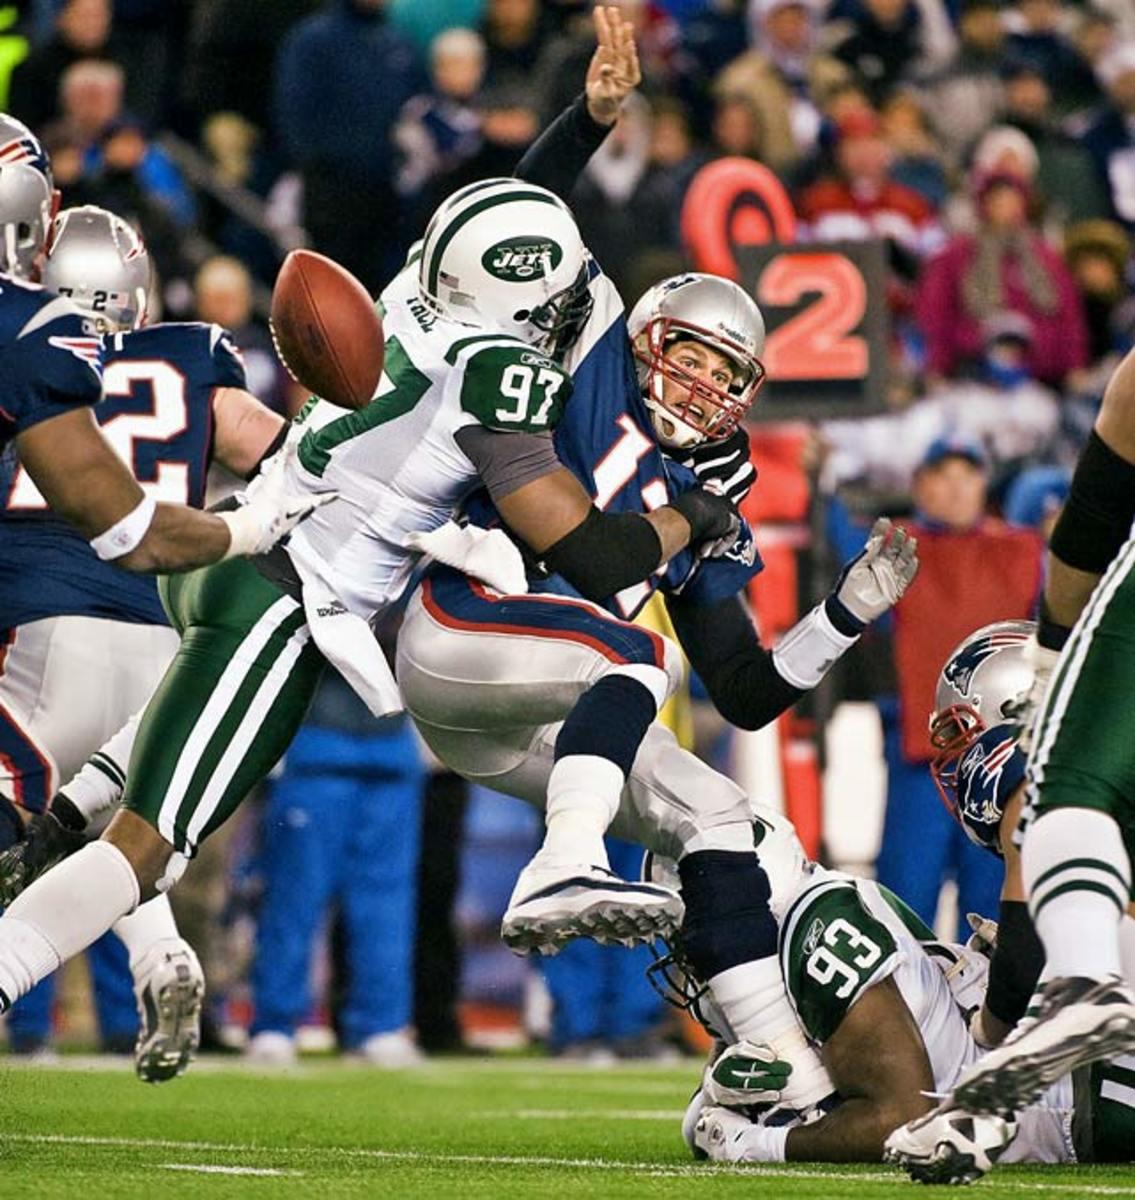 2010 New England Patriots (14-2)